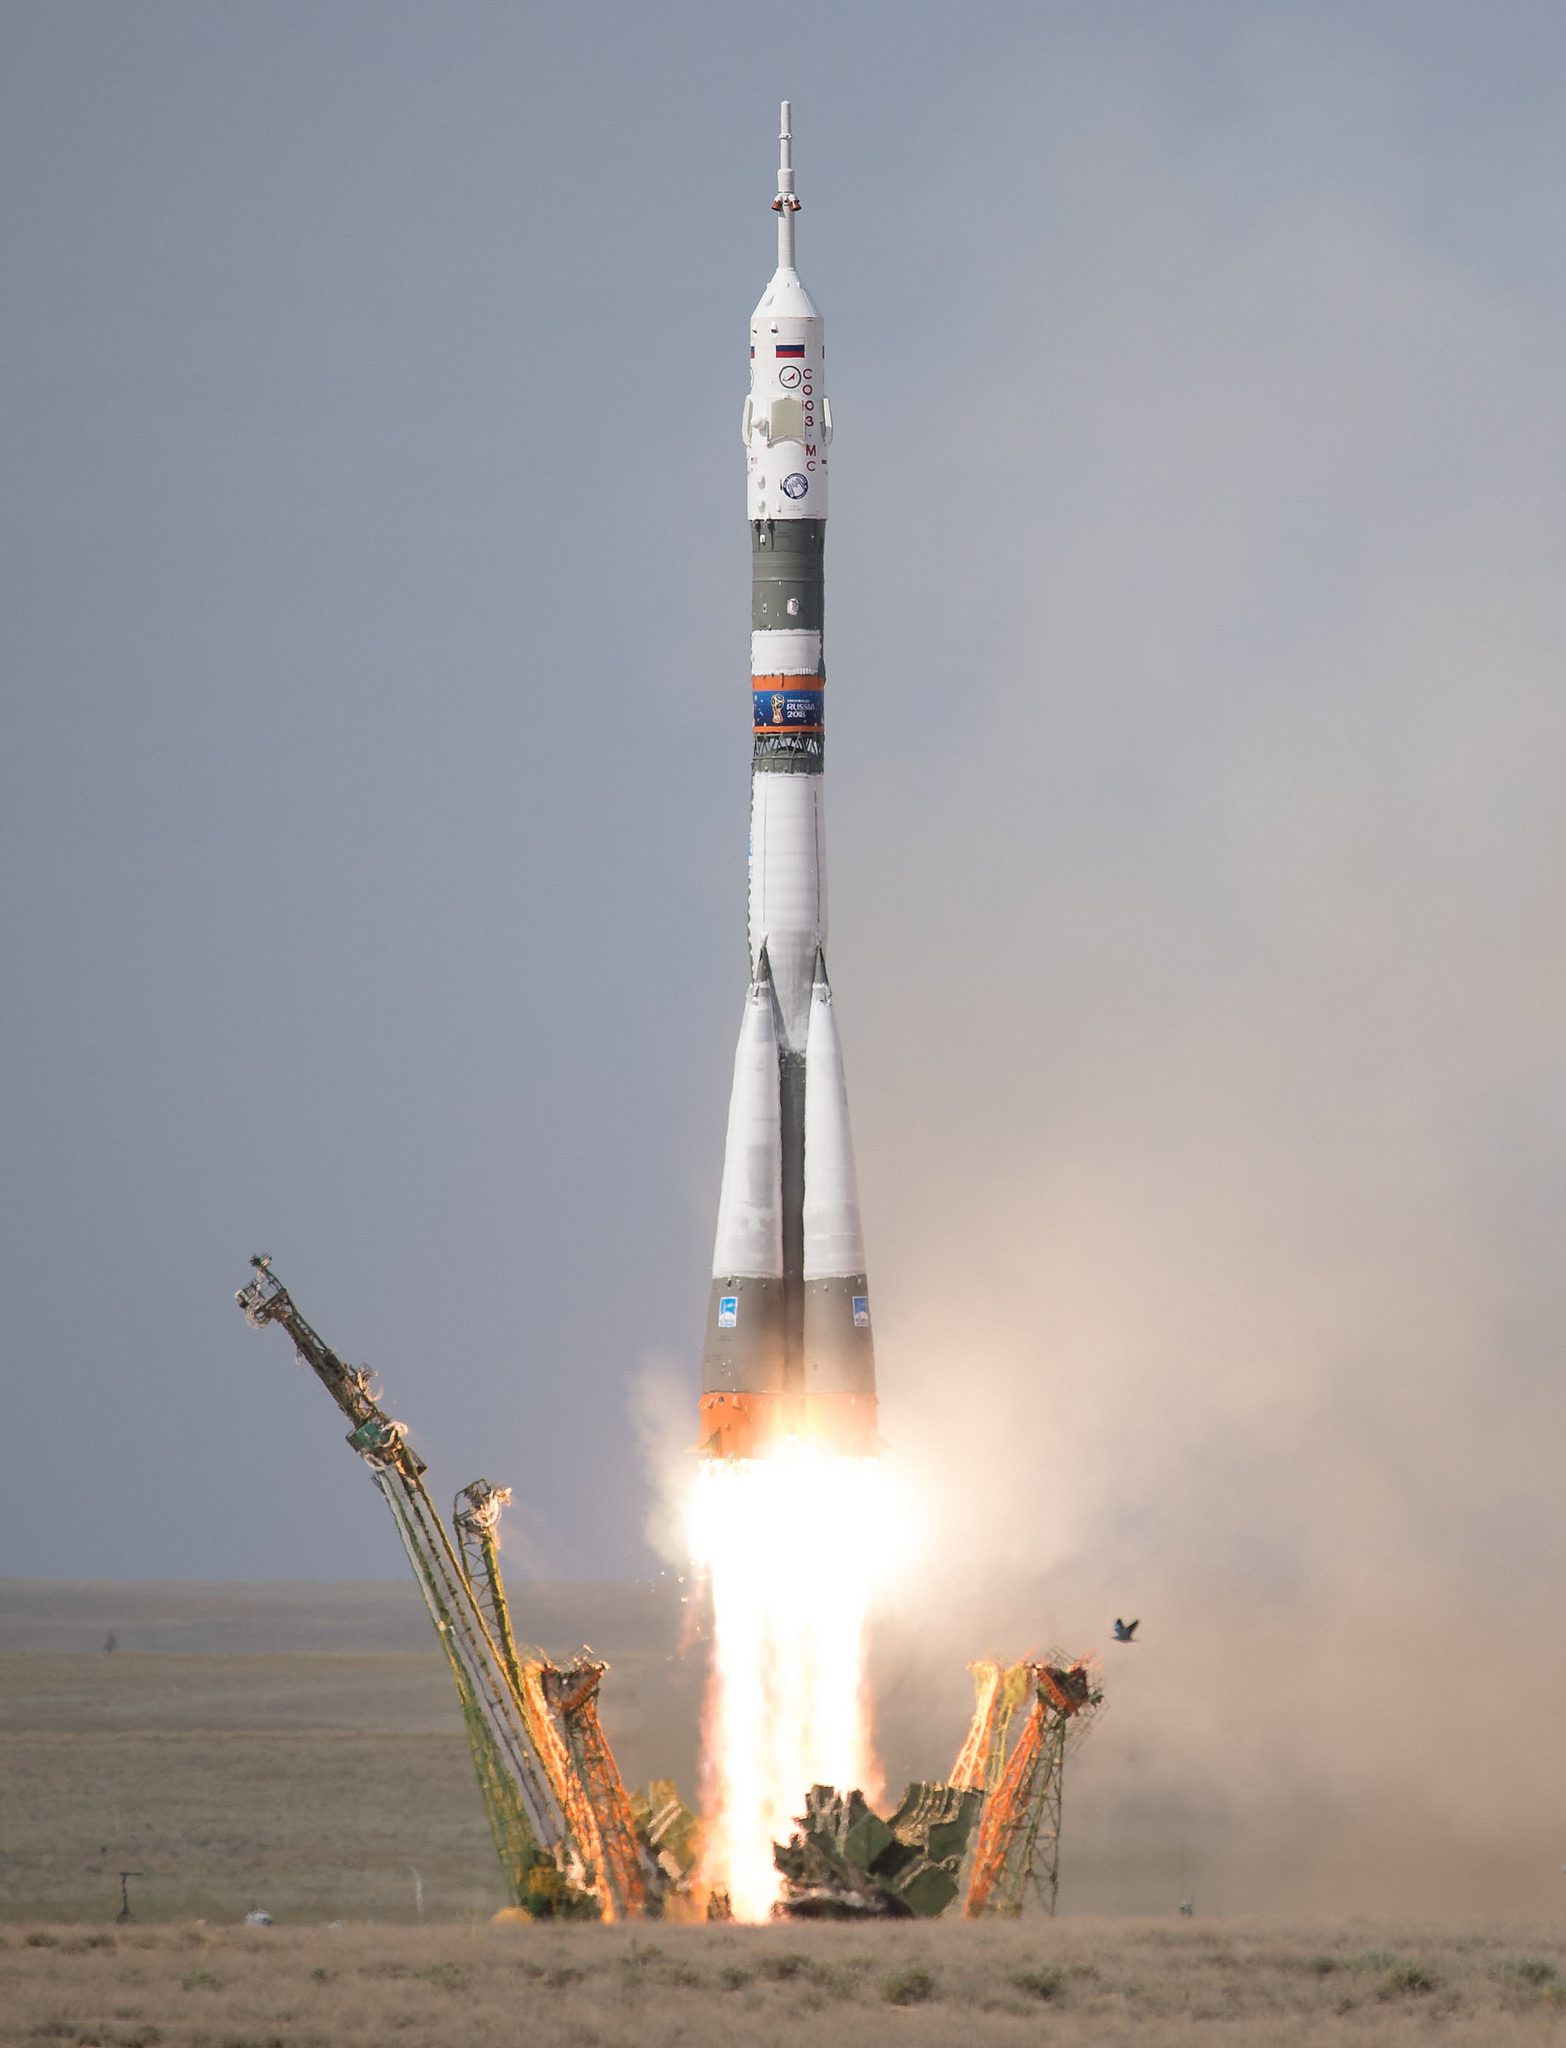 Soyuz MS-09 launches toward space. Photo Credit: Joel Kowsky / NASA